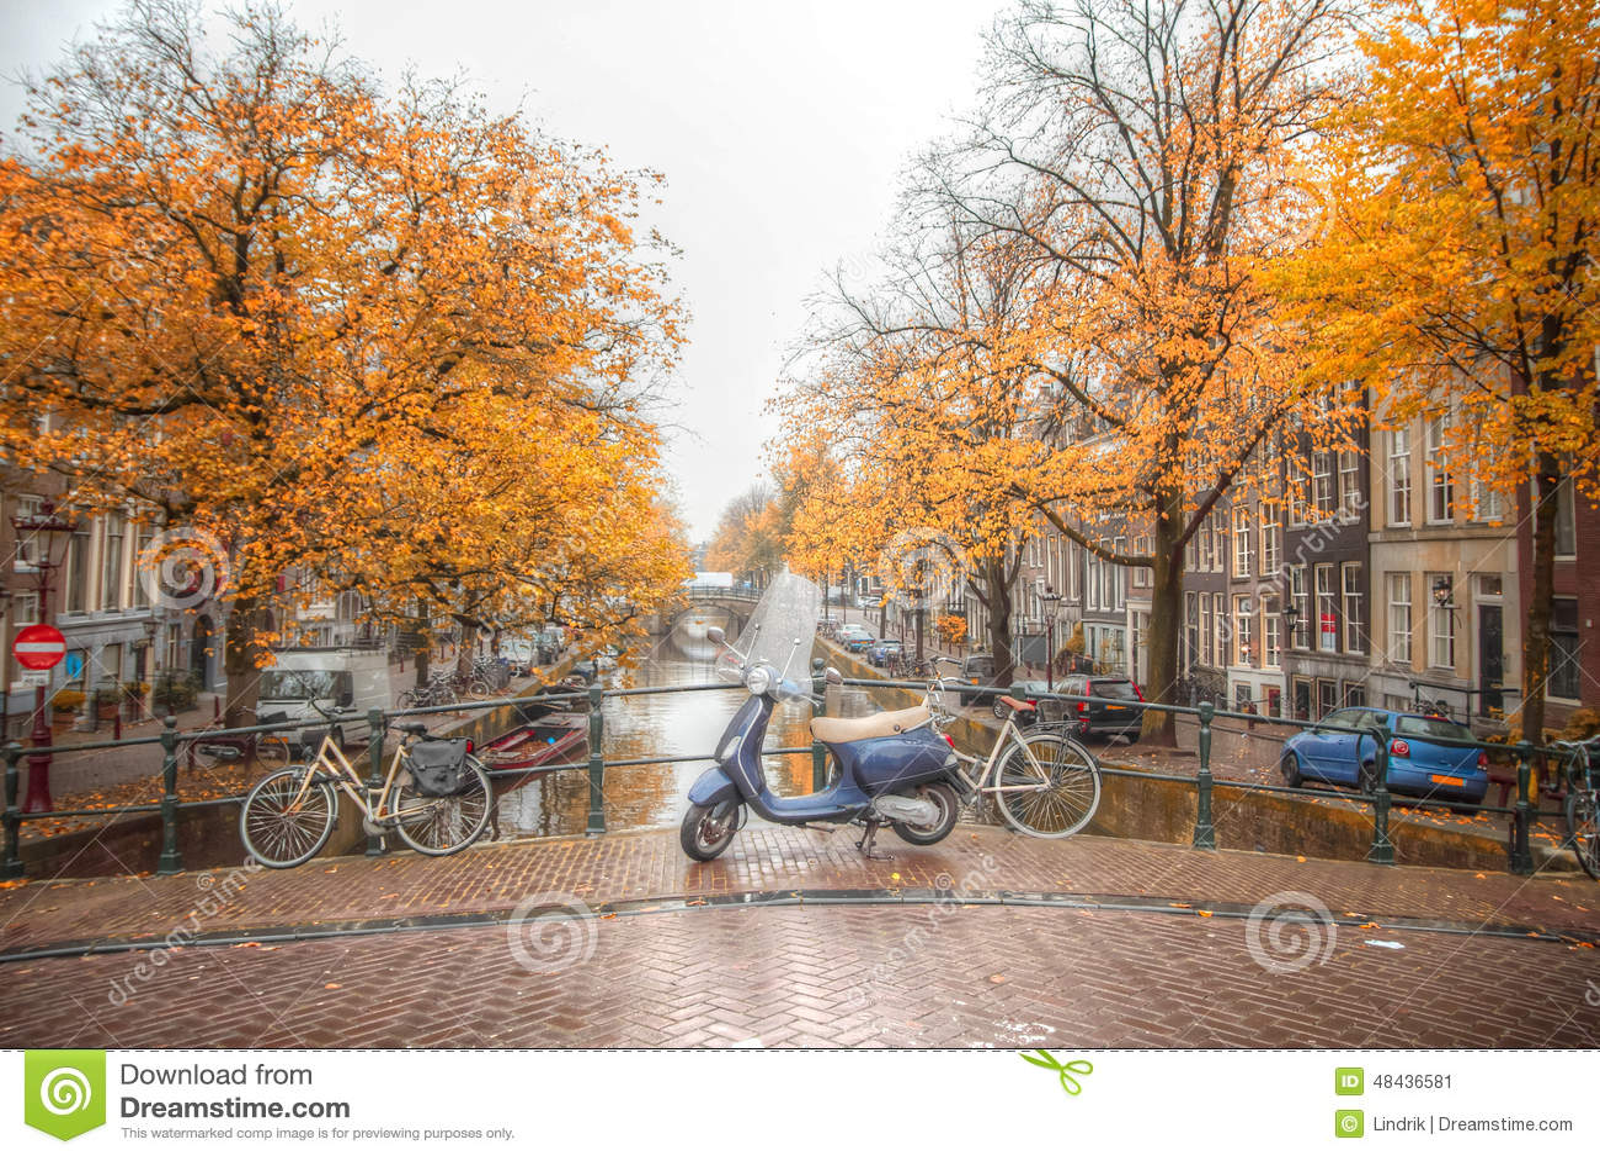 Amsterdam Autumn Stock Photo Image 48436581